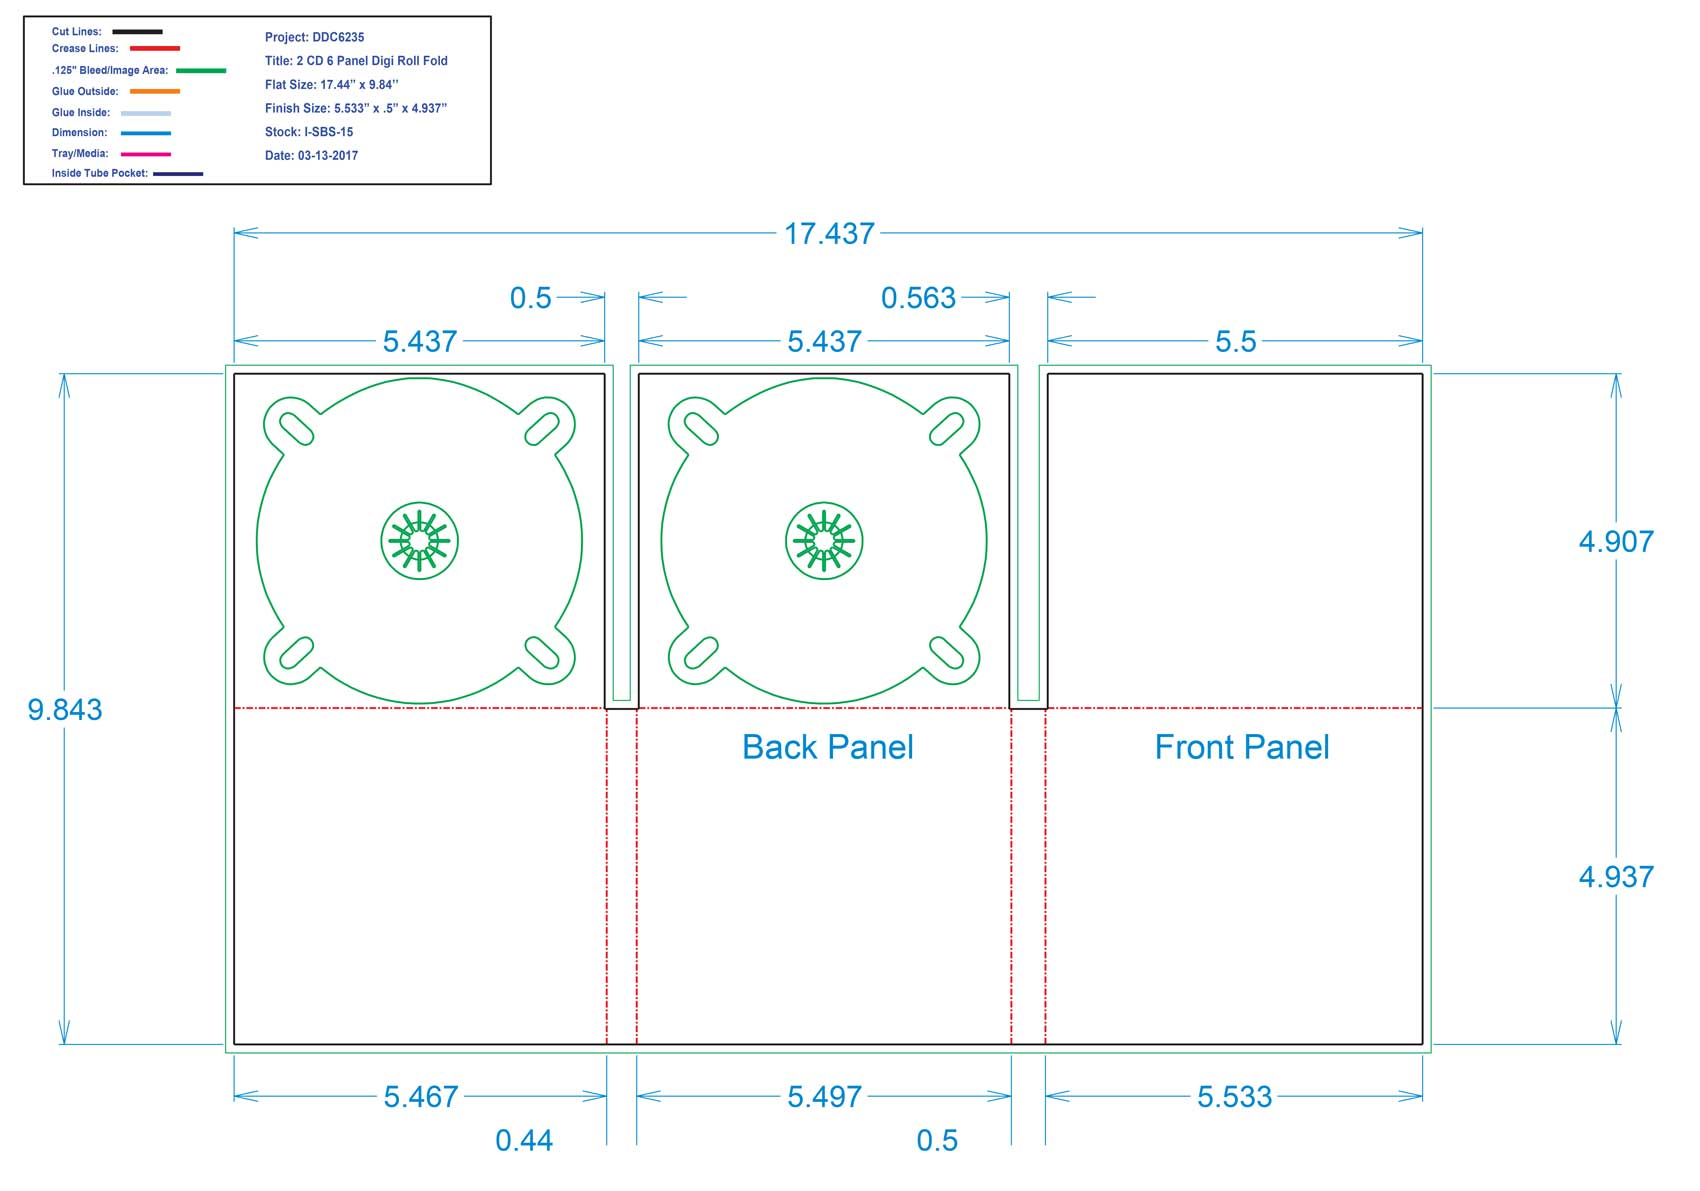 DDC6235 6 Panel Digi 2 Tray, No Pocket